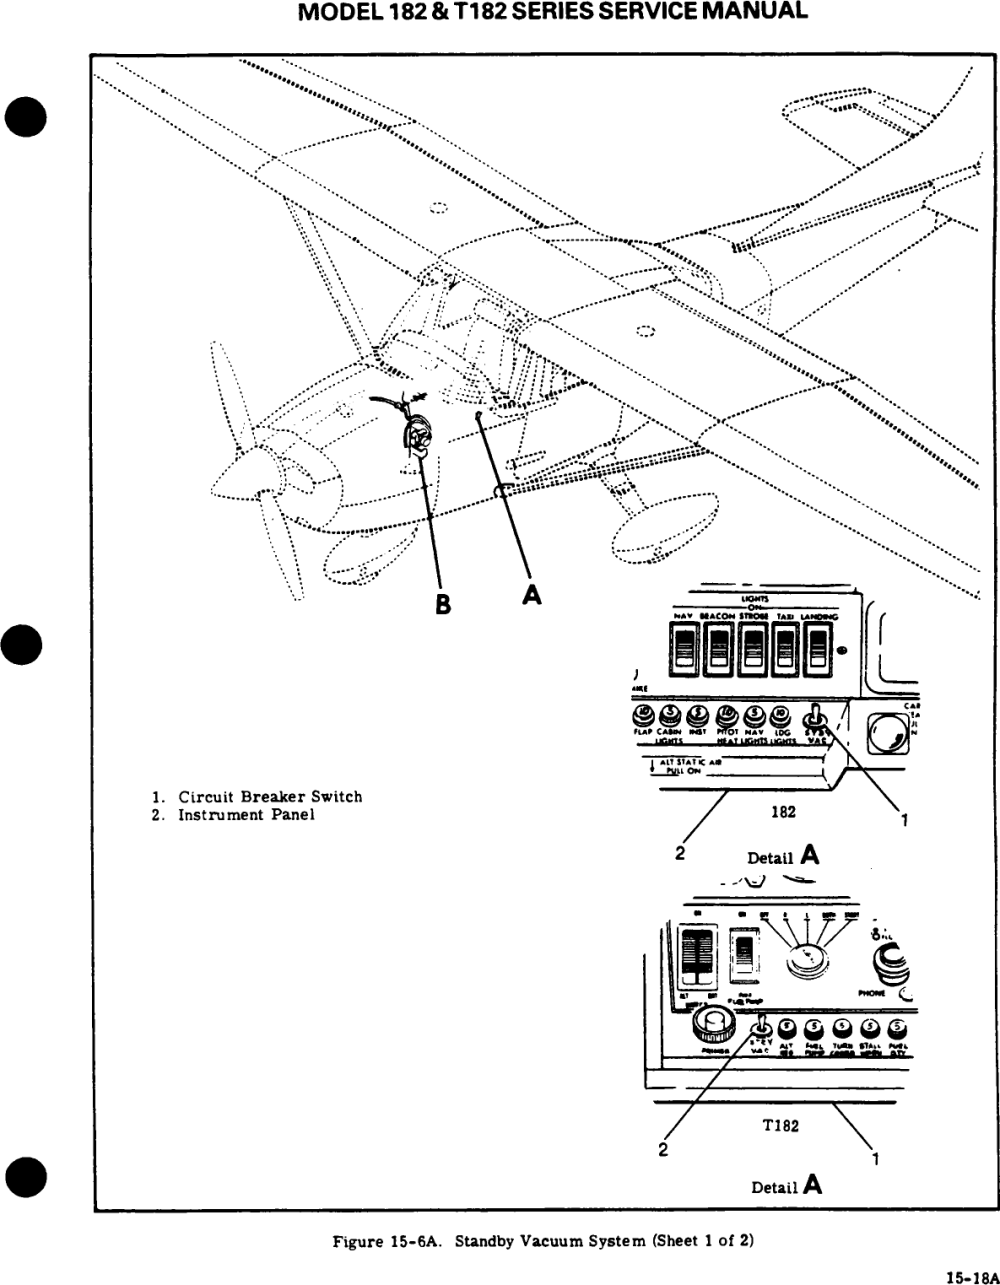 medium resolution of d2068 3 13 s 182 and t182 series 1977 thru 1986 cessna 182 t182 1977 1986 mm d2068 cessna 1977 1986 mm